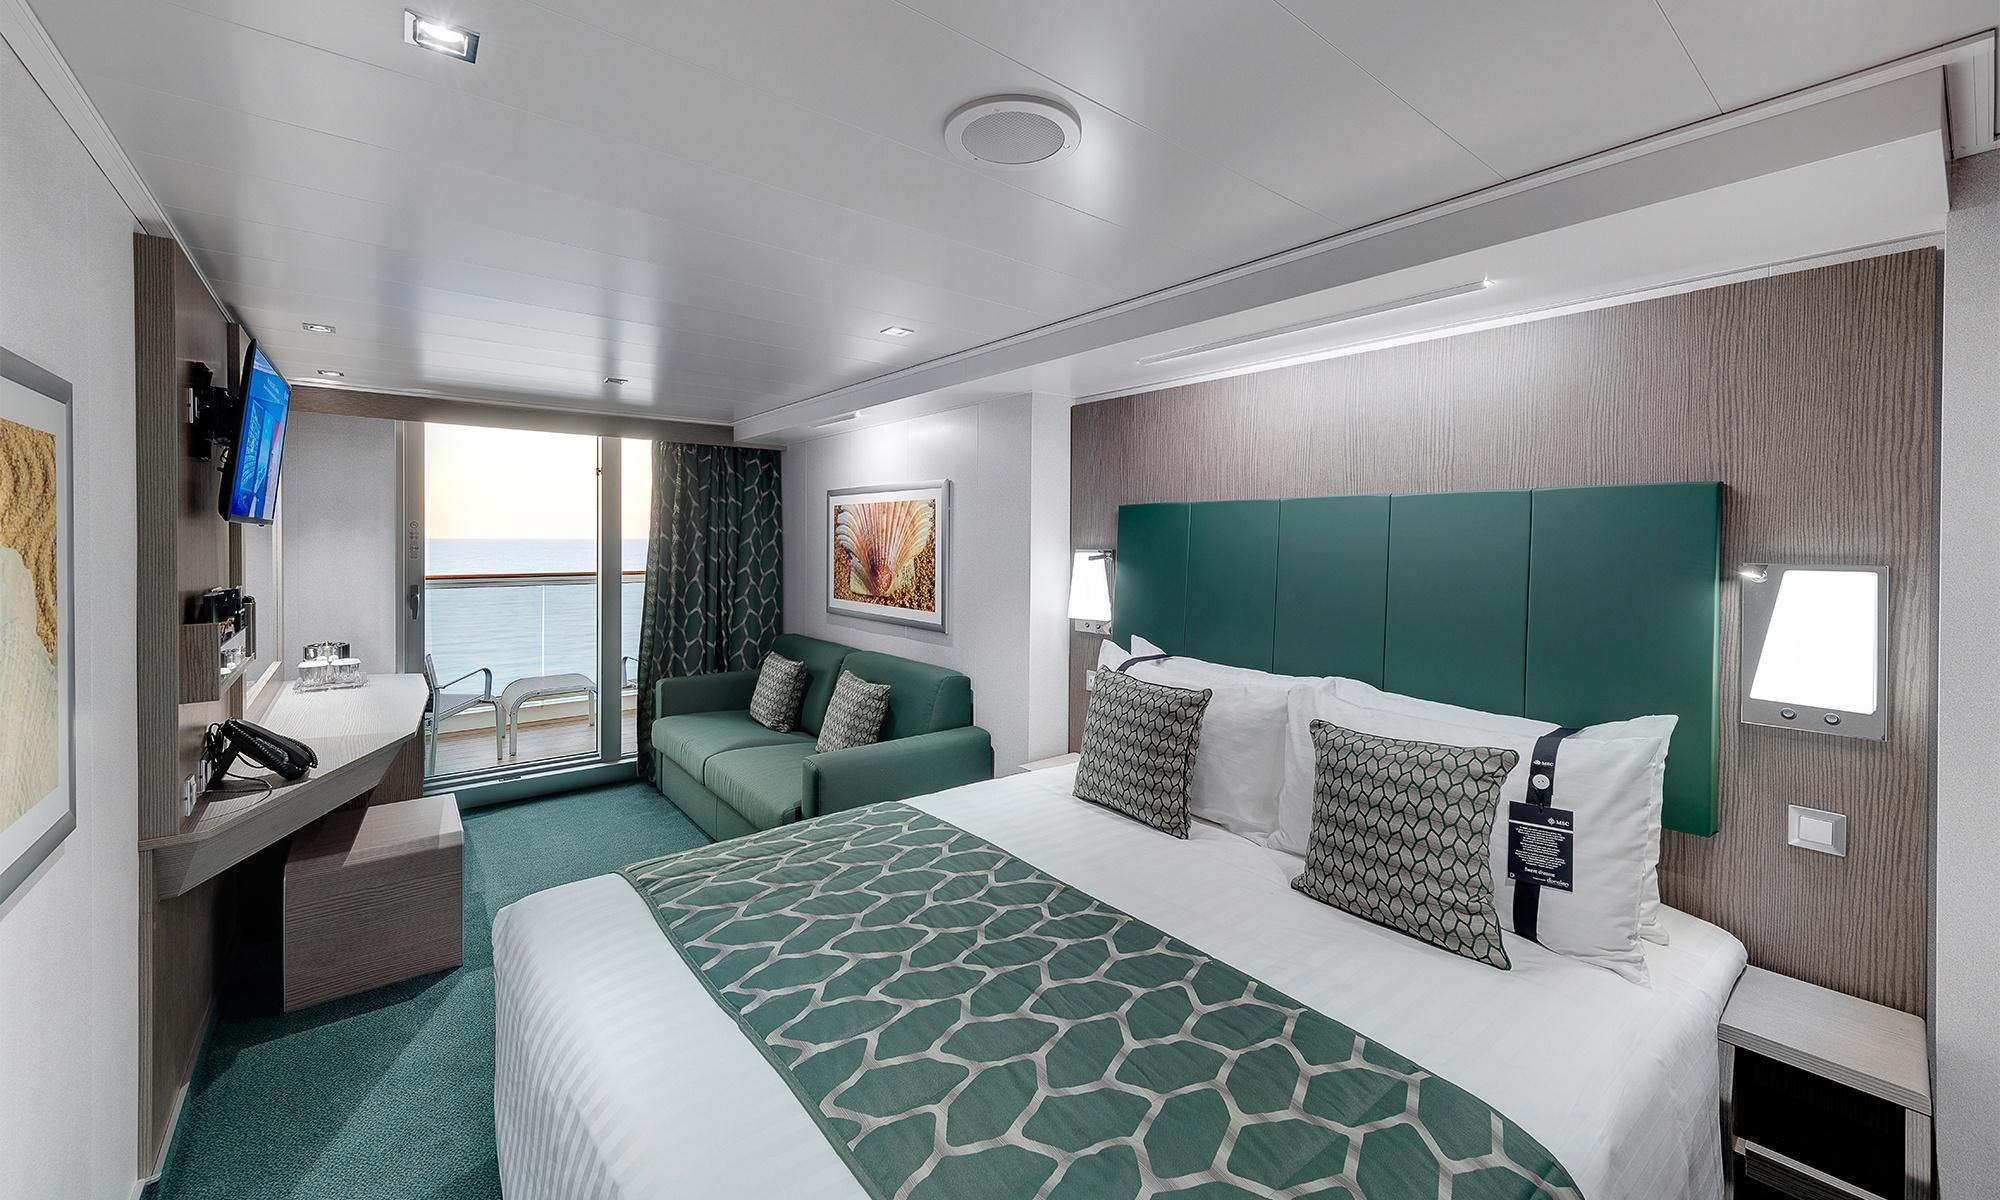 Cheap Cruise Deals >> MSC Seaview Cruise Ship Reviews & Itineraries